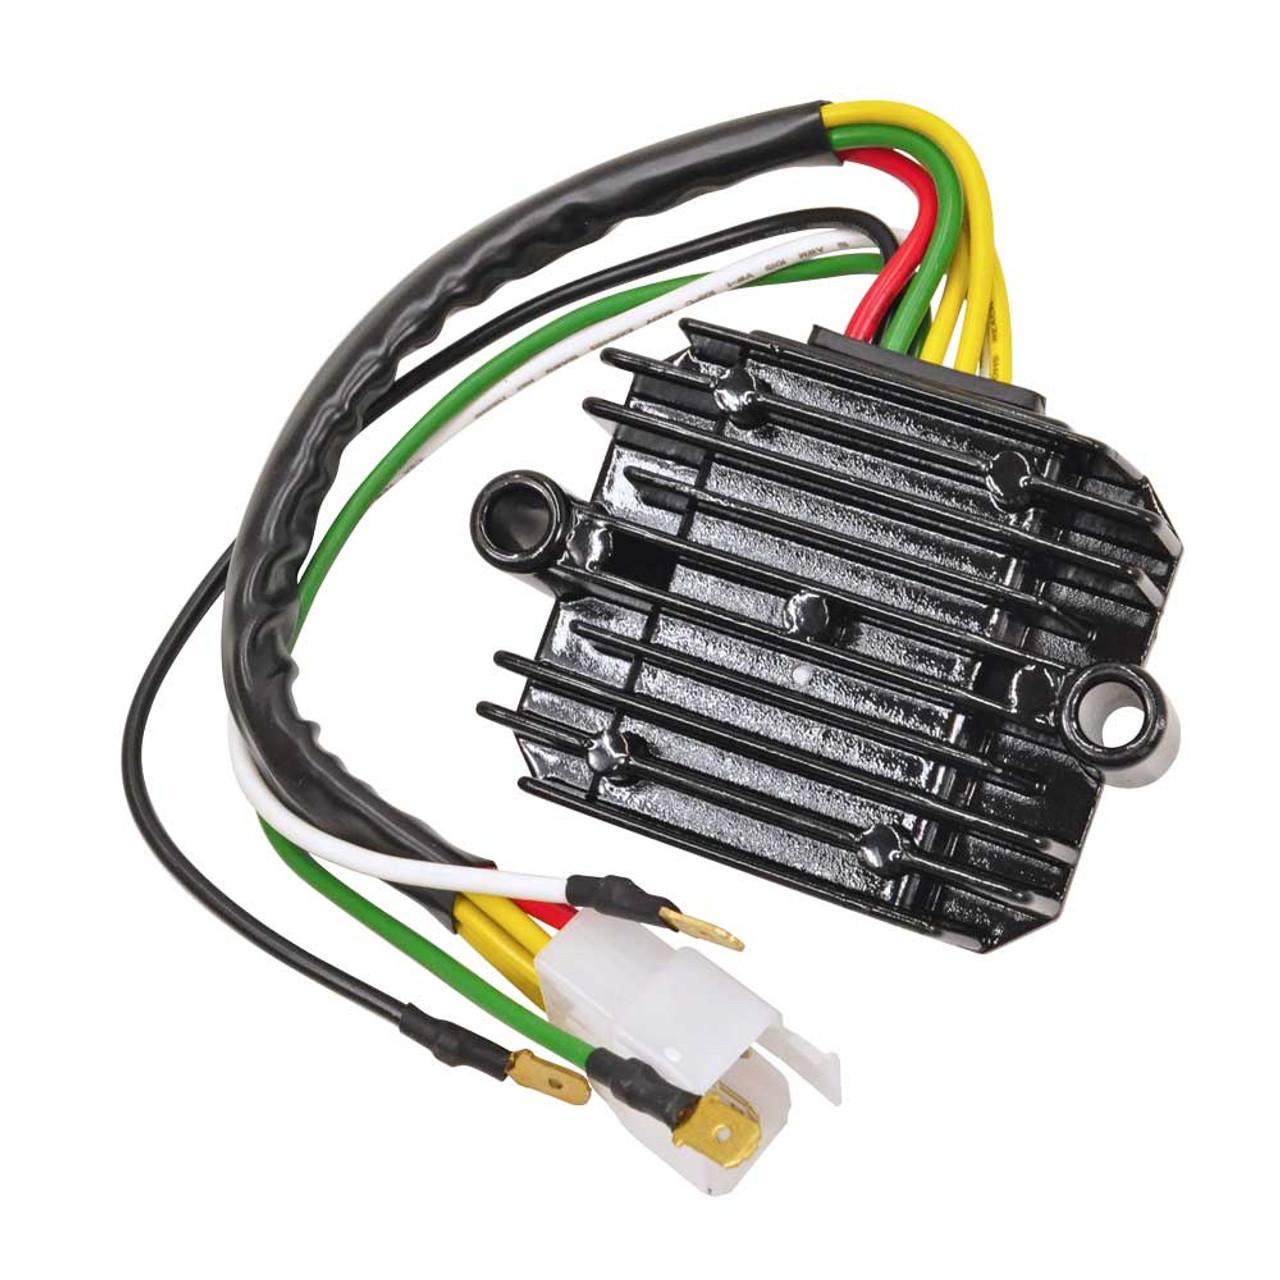 hight resolution of rick s motorsport electrics lithium ion battery compatible regulator rectifier 14 100 main image